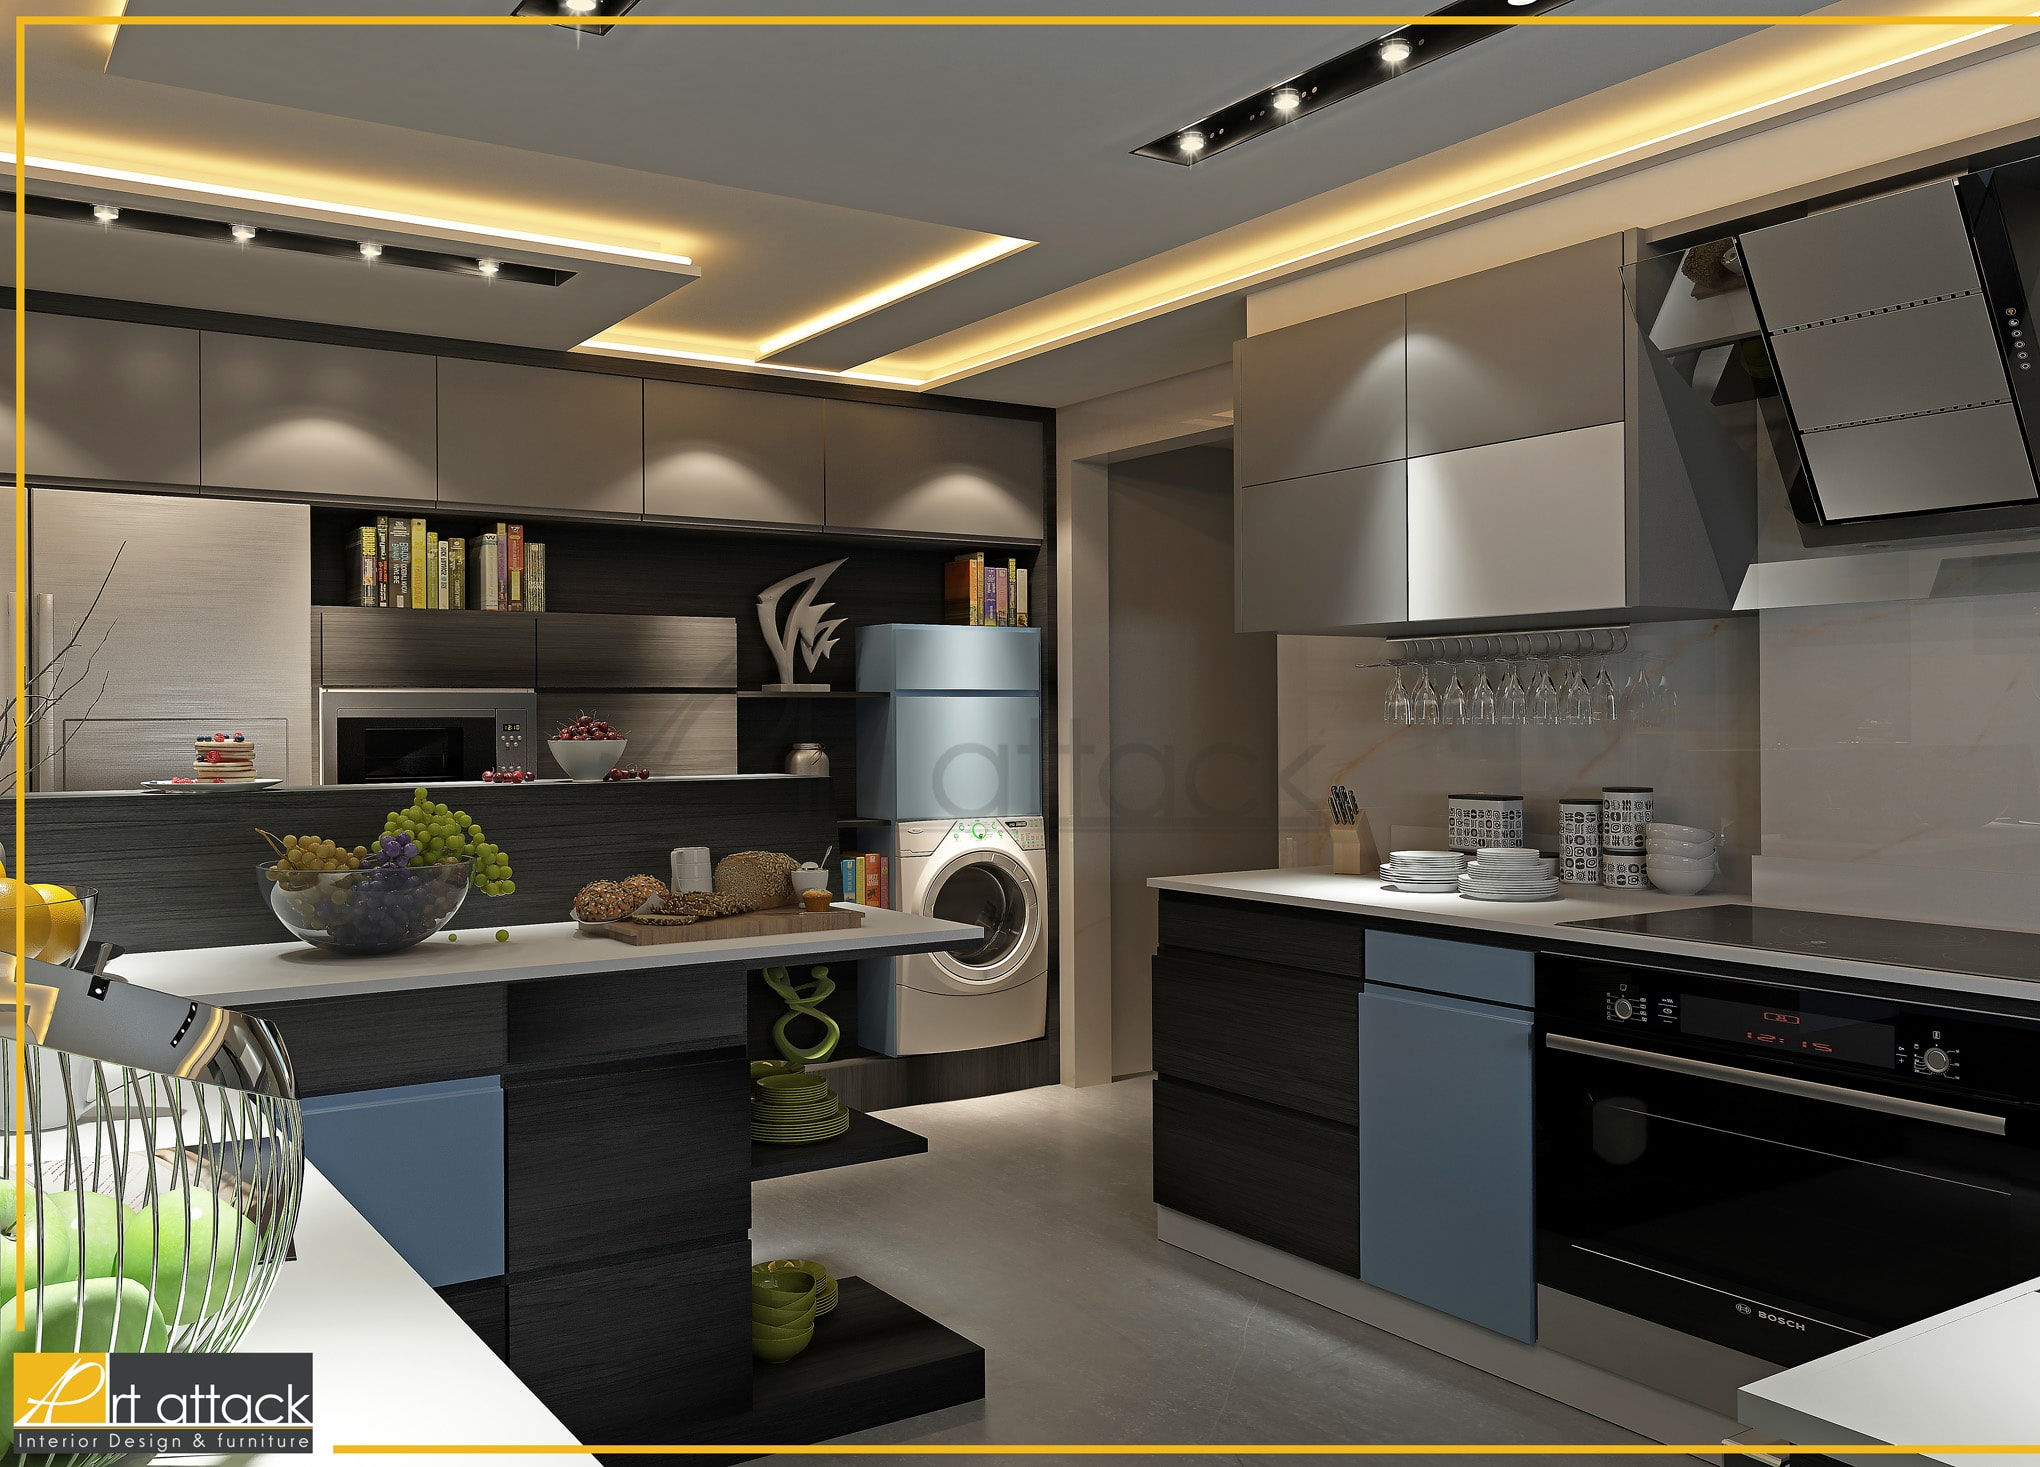 kitchen f 2 psd p